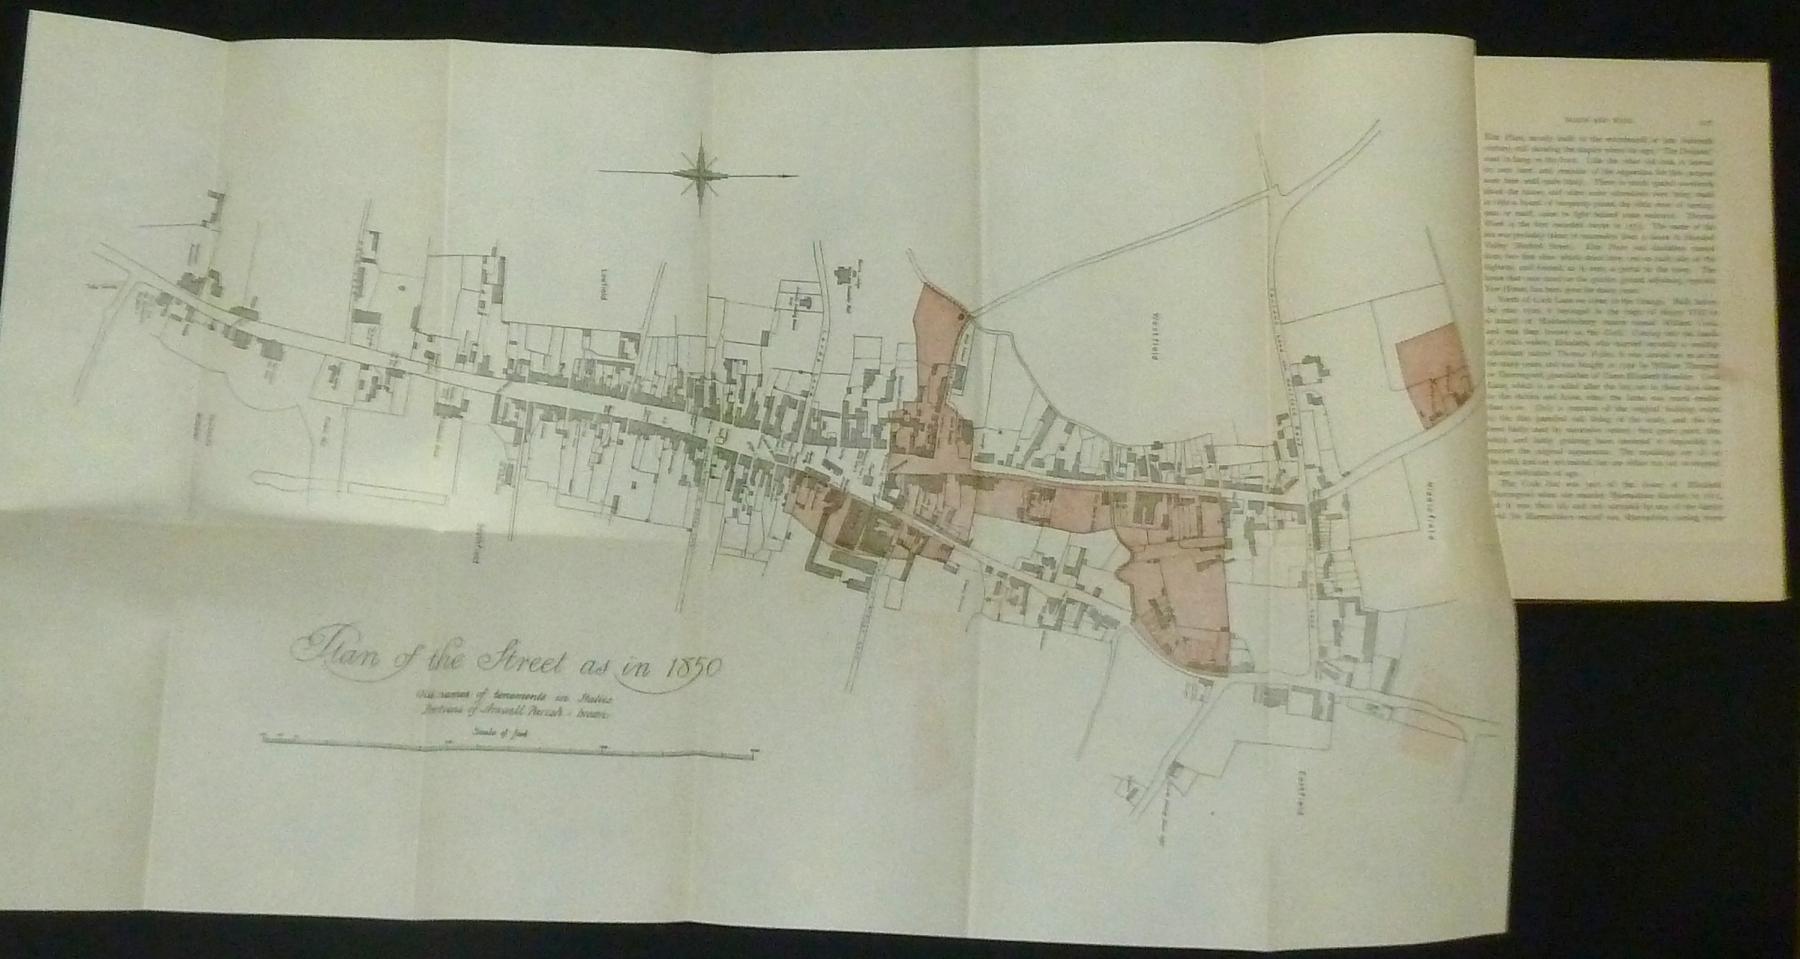 History of Hoddesdon